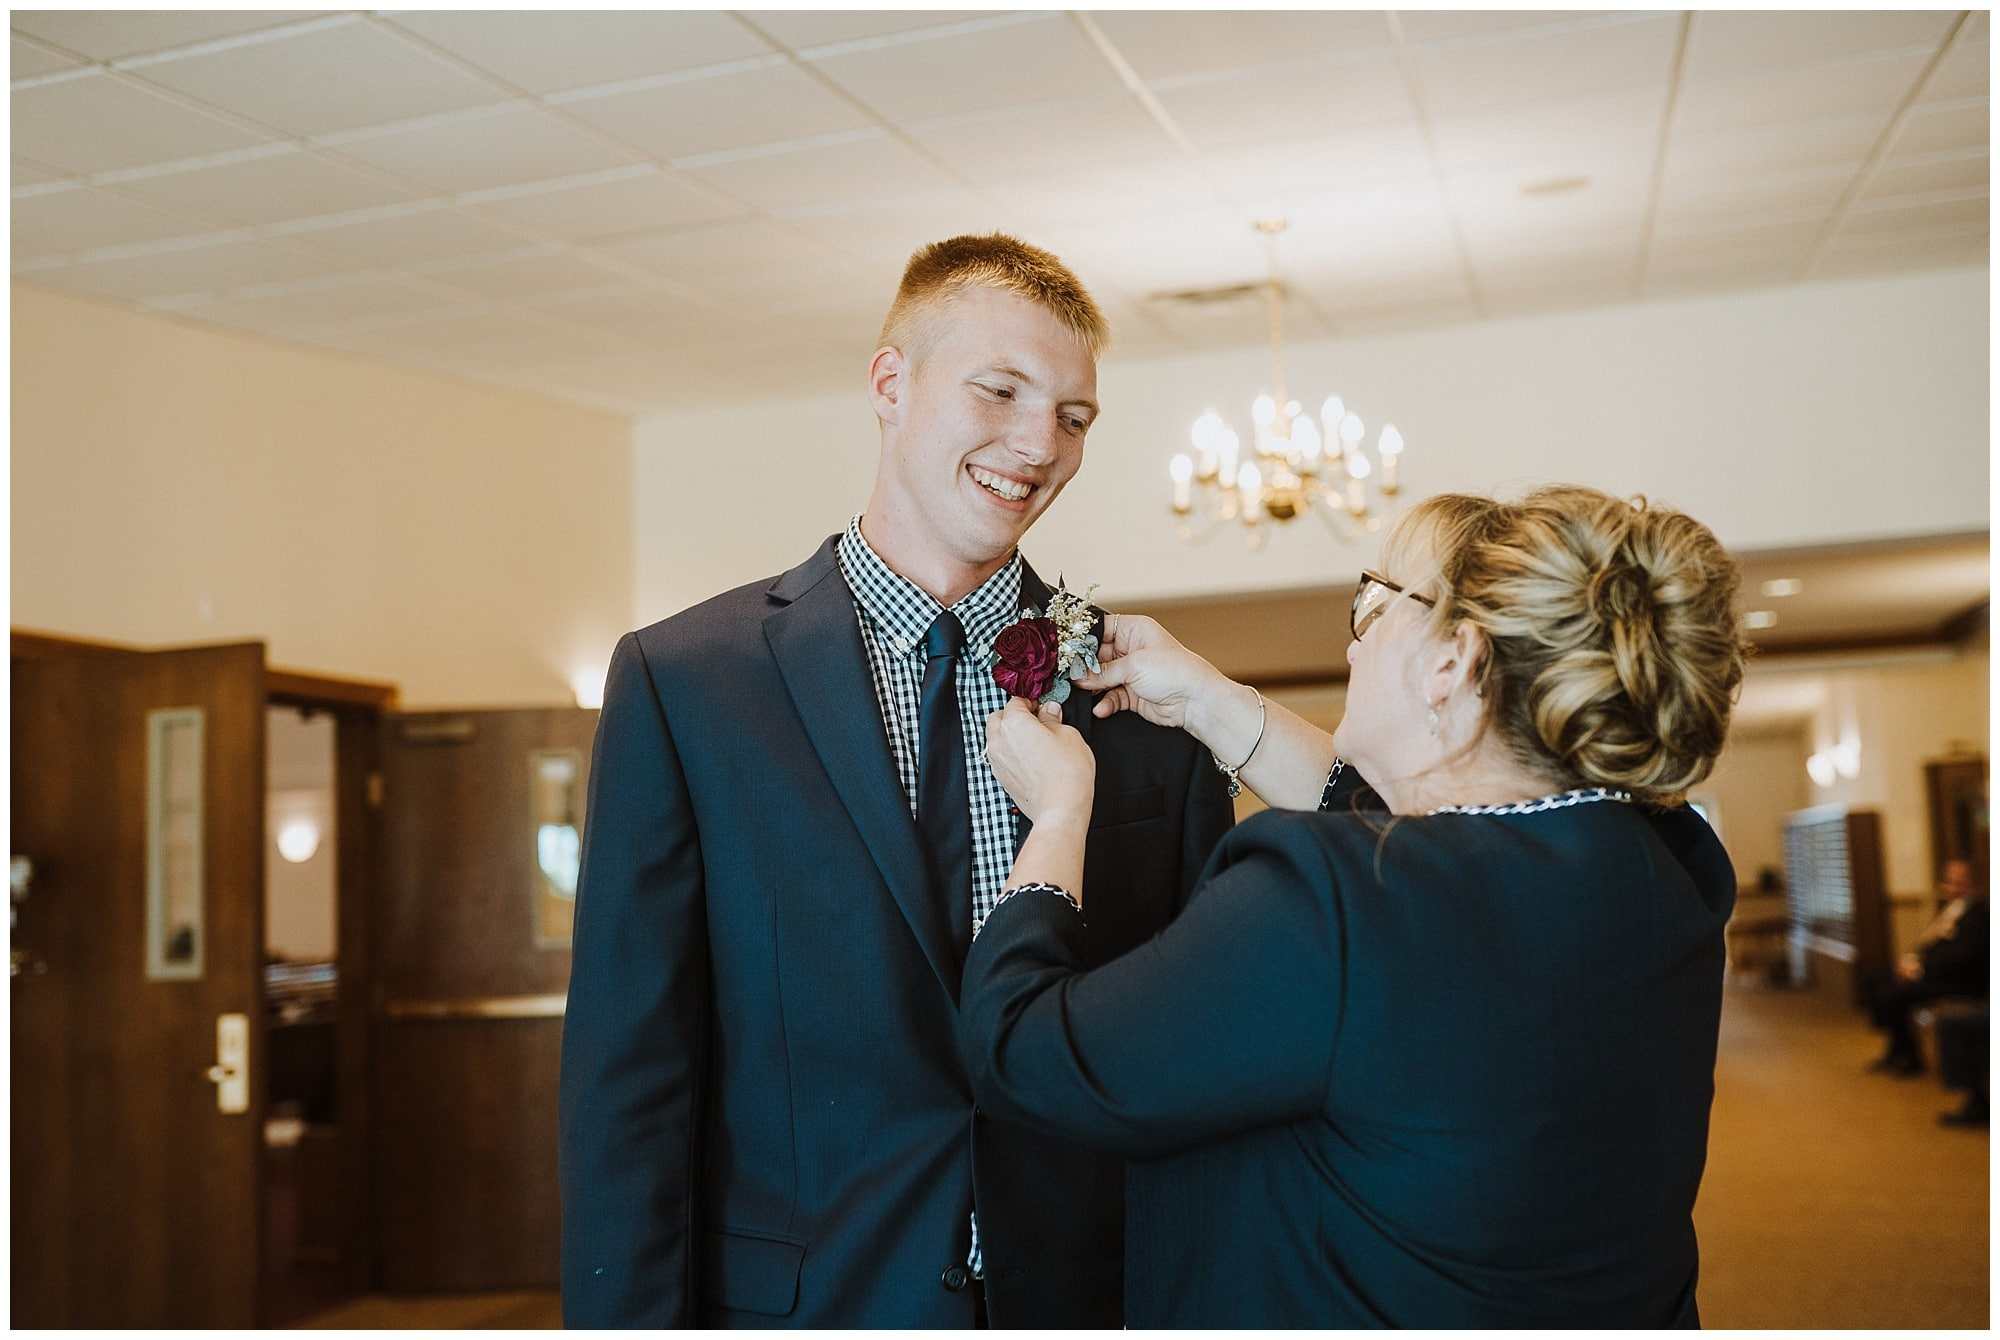 Adrian Michigan Wedding Photographer-8.JPG